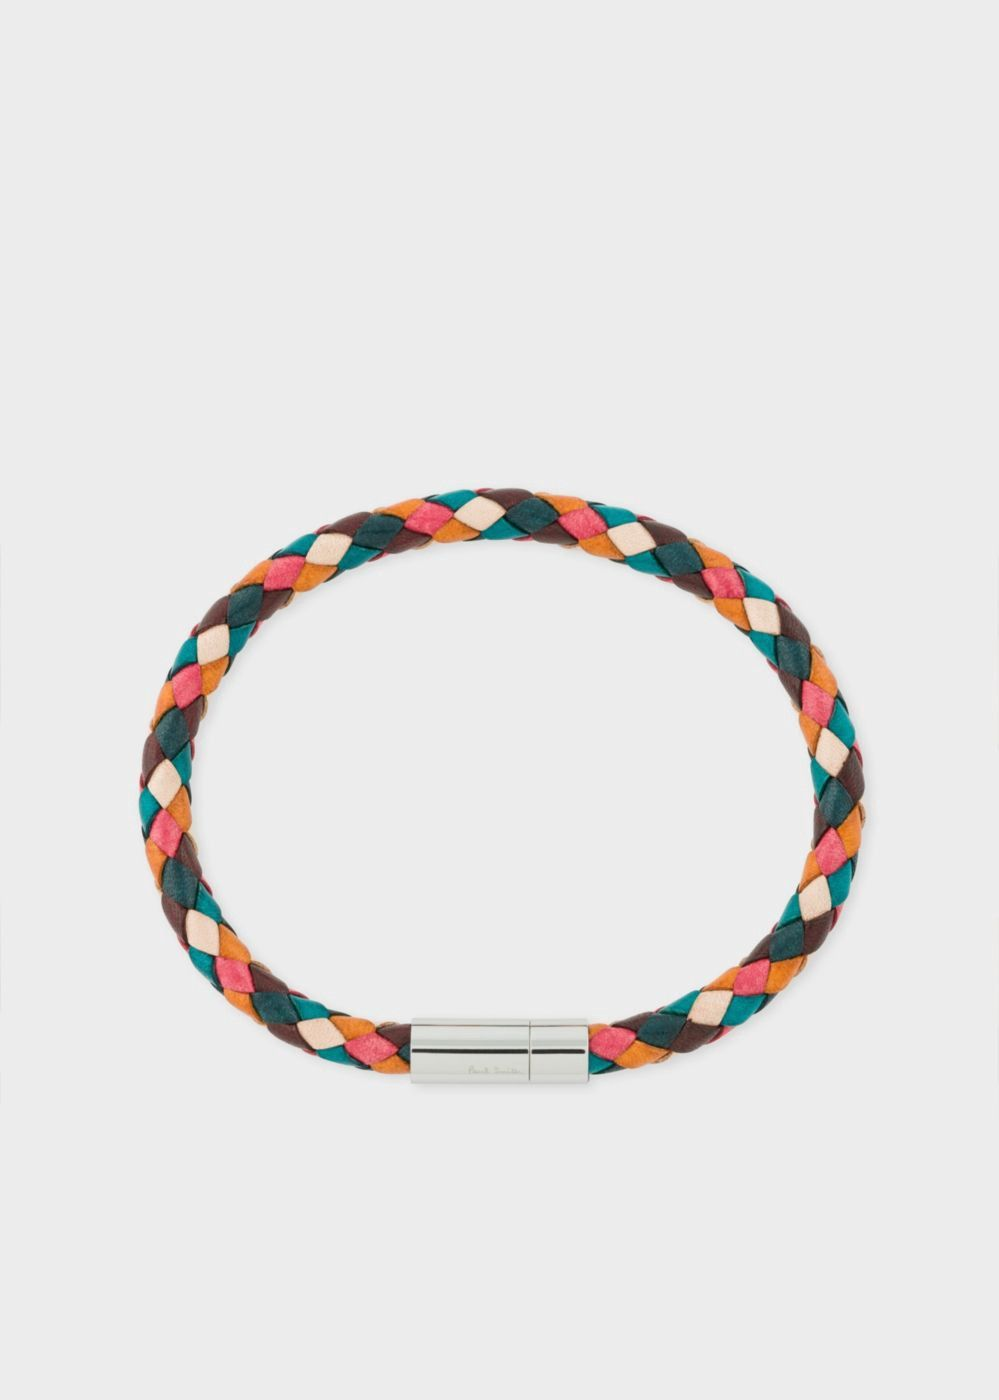 3ba9fe4c5d472 PAUL SMITH Men's Multi-Coloured Leather Plaited Bracelet. #paulsmith ...